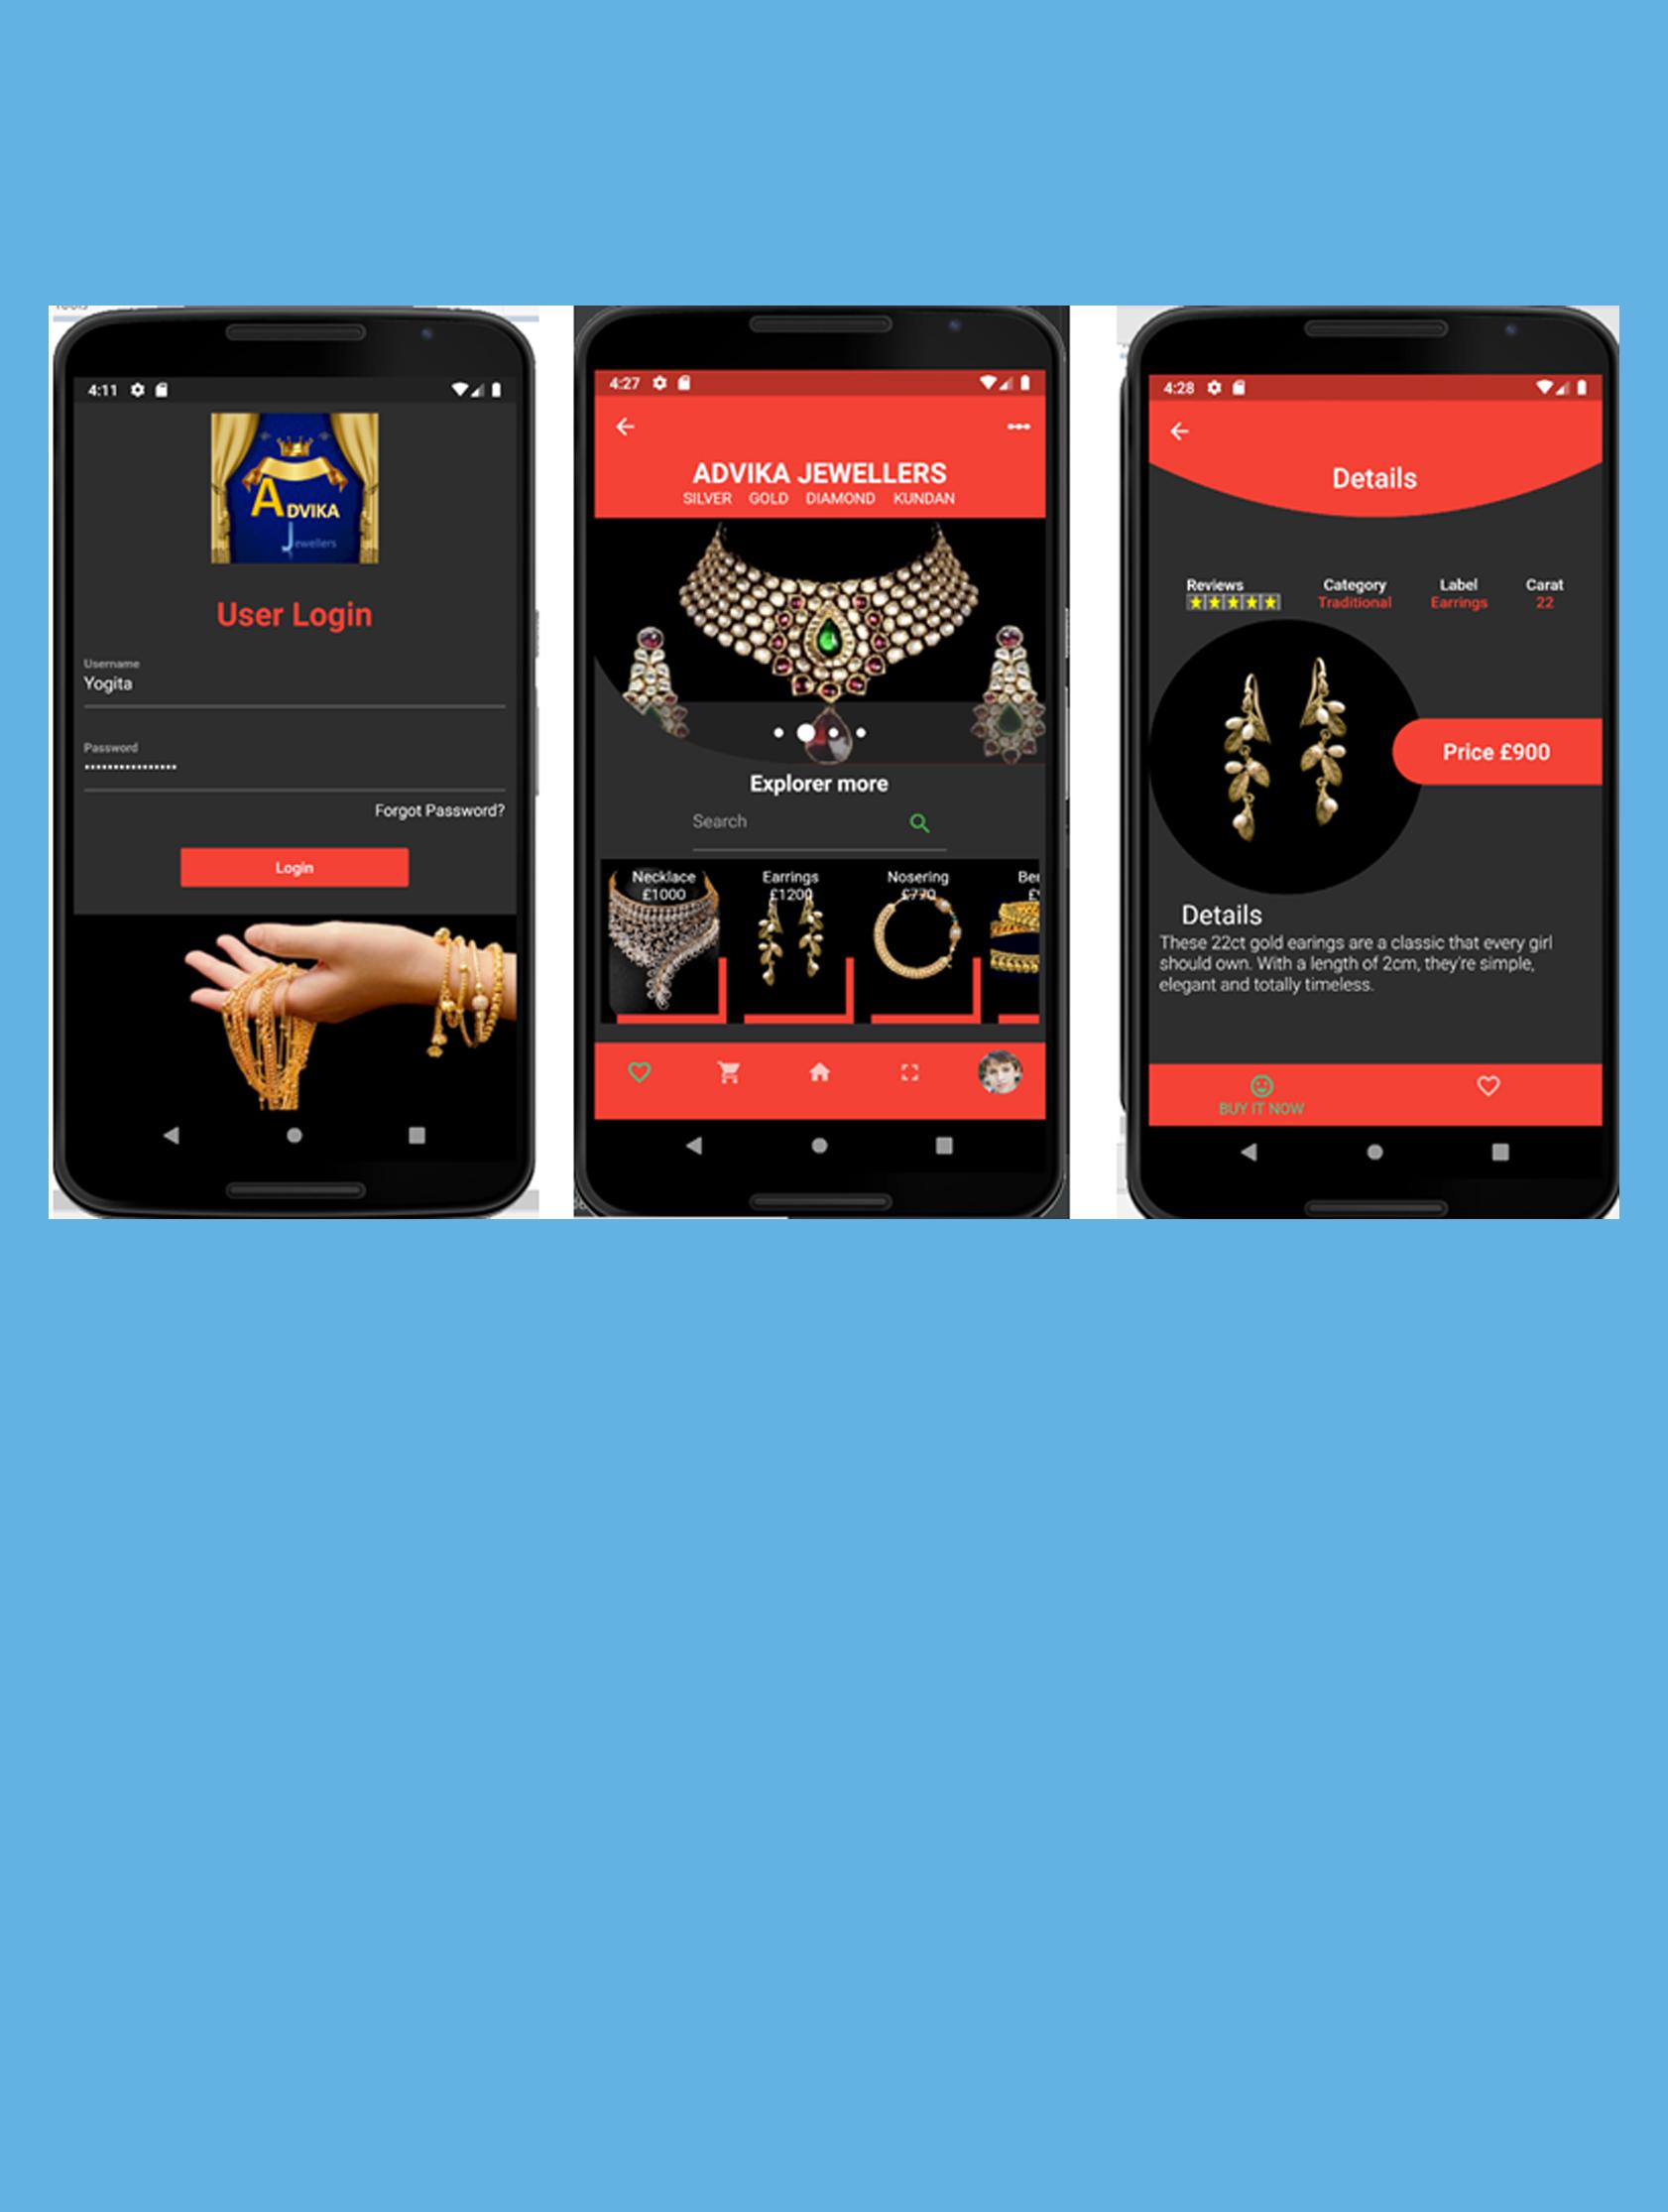 jwellery_app